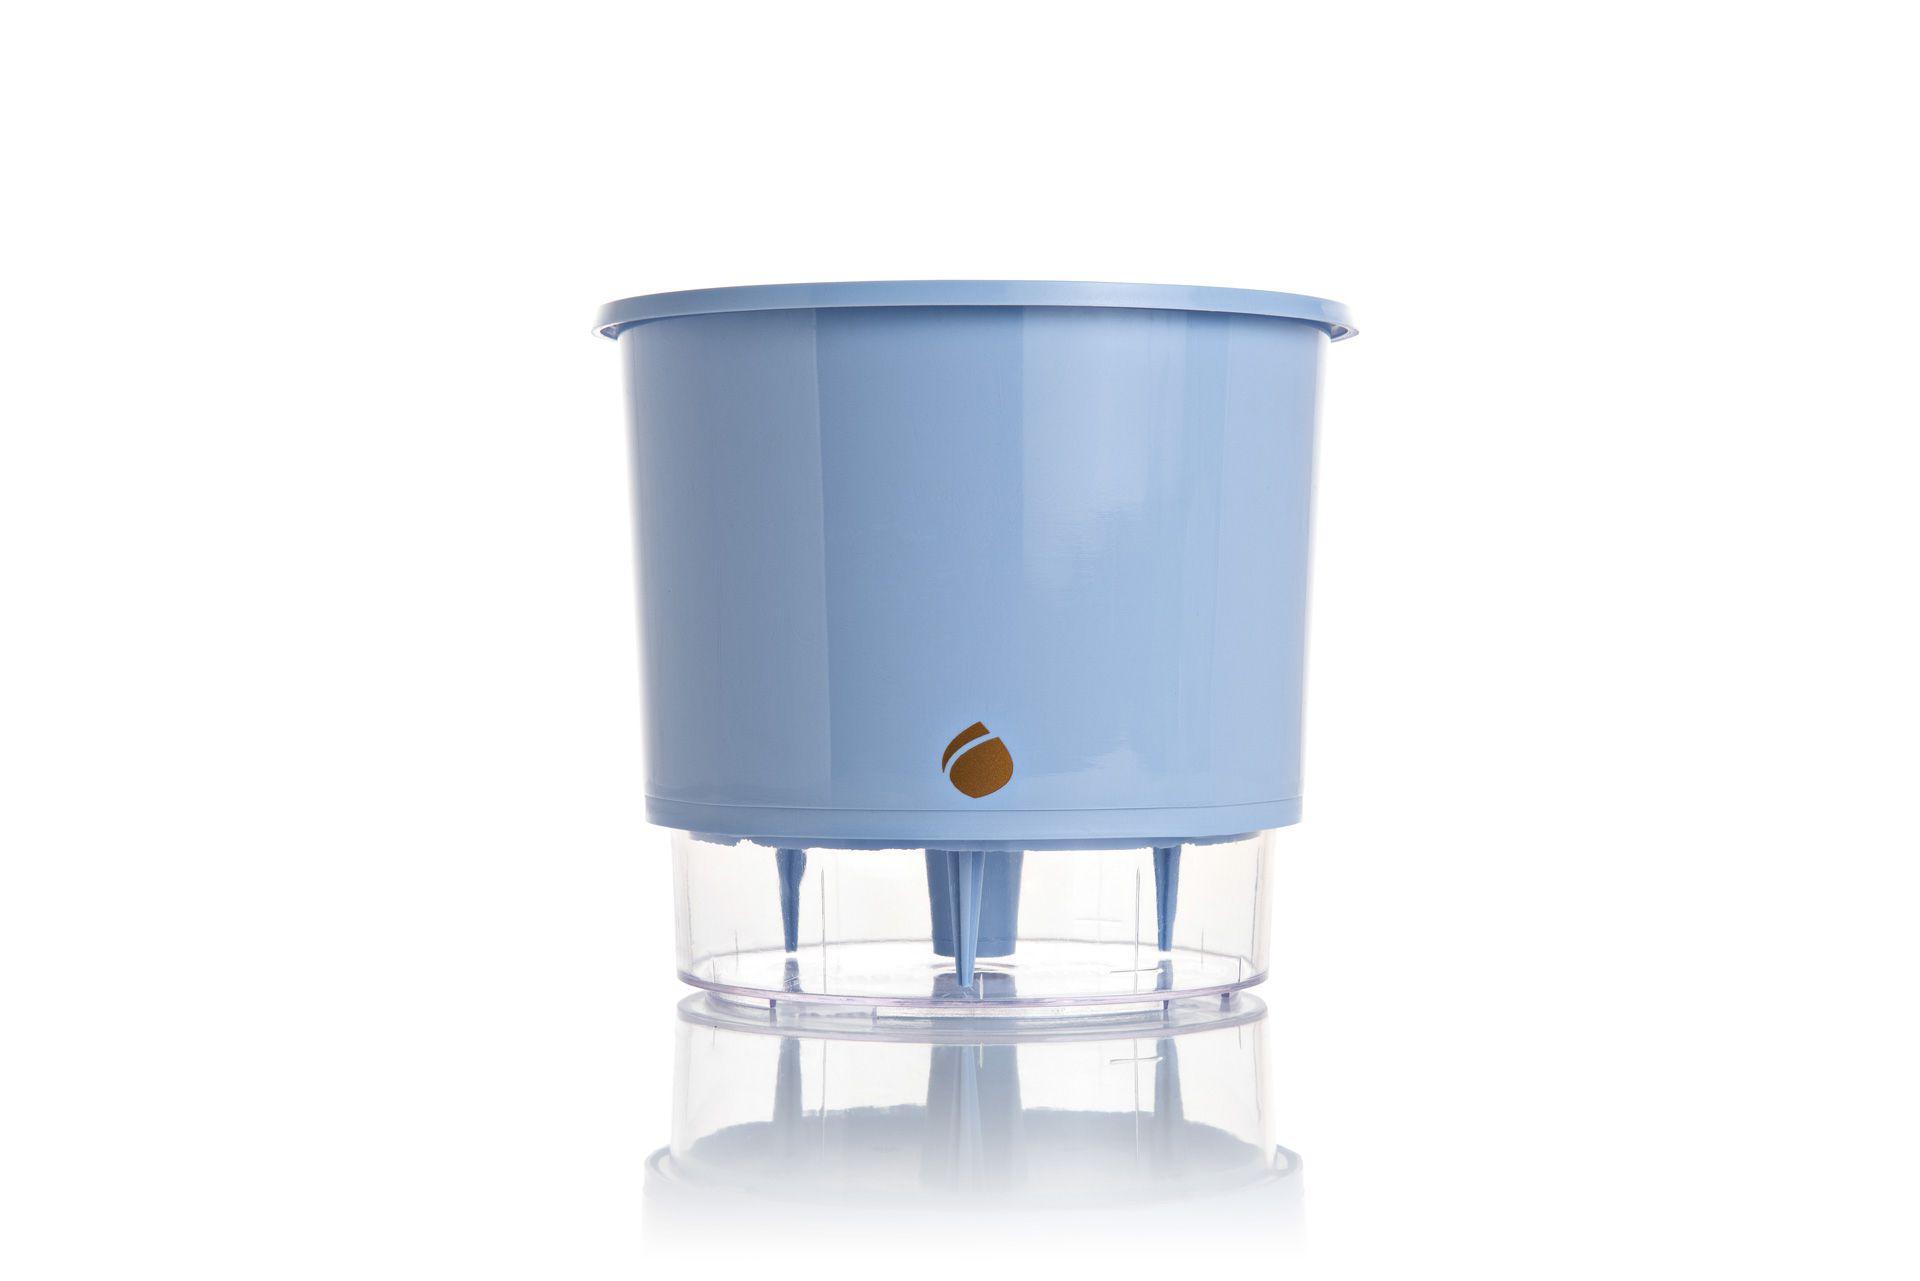 Vaso Autoirrigável 3 Azul Serenity Raiz